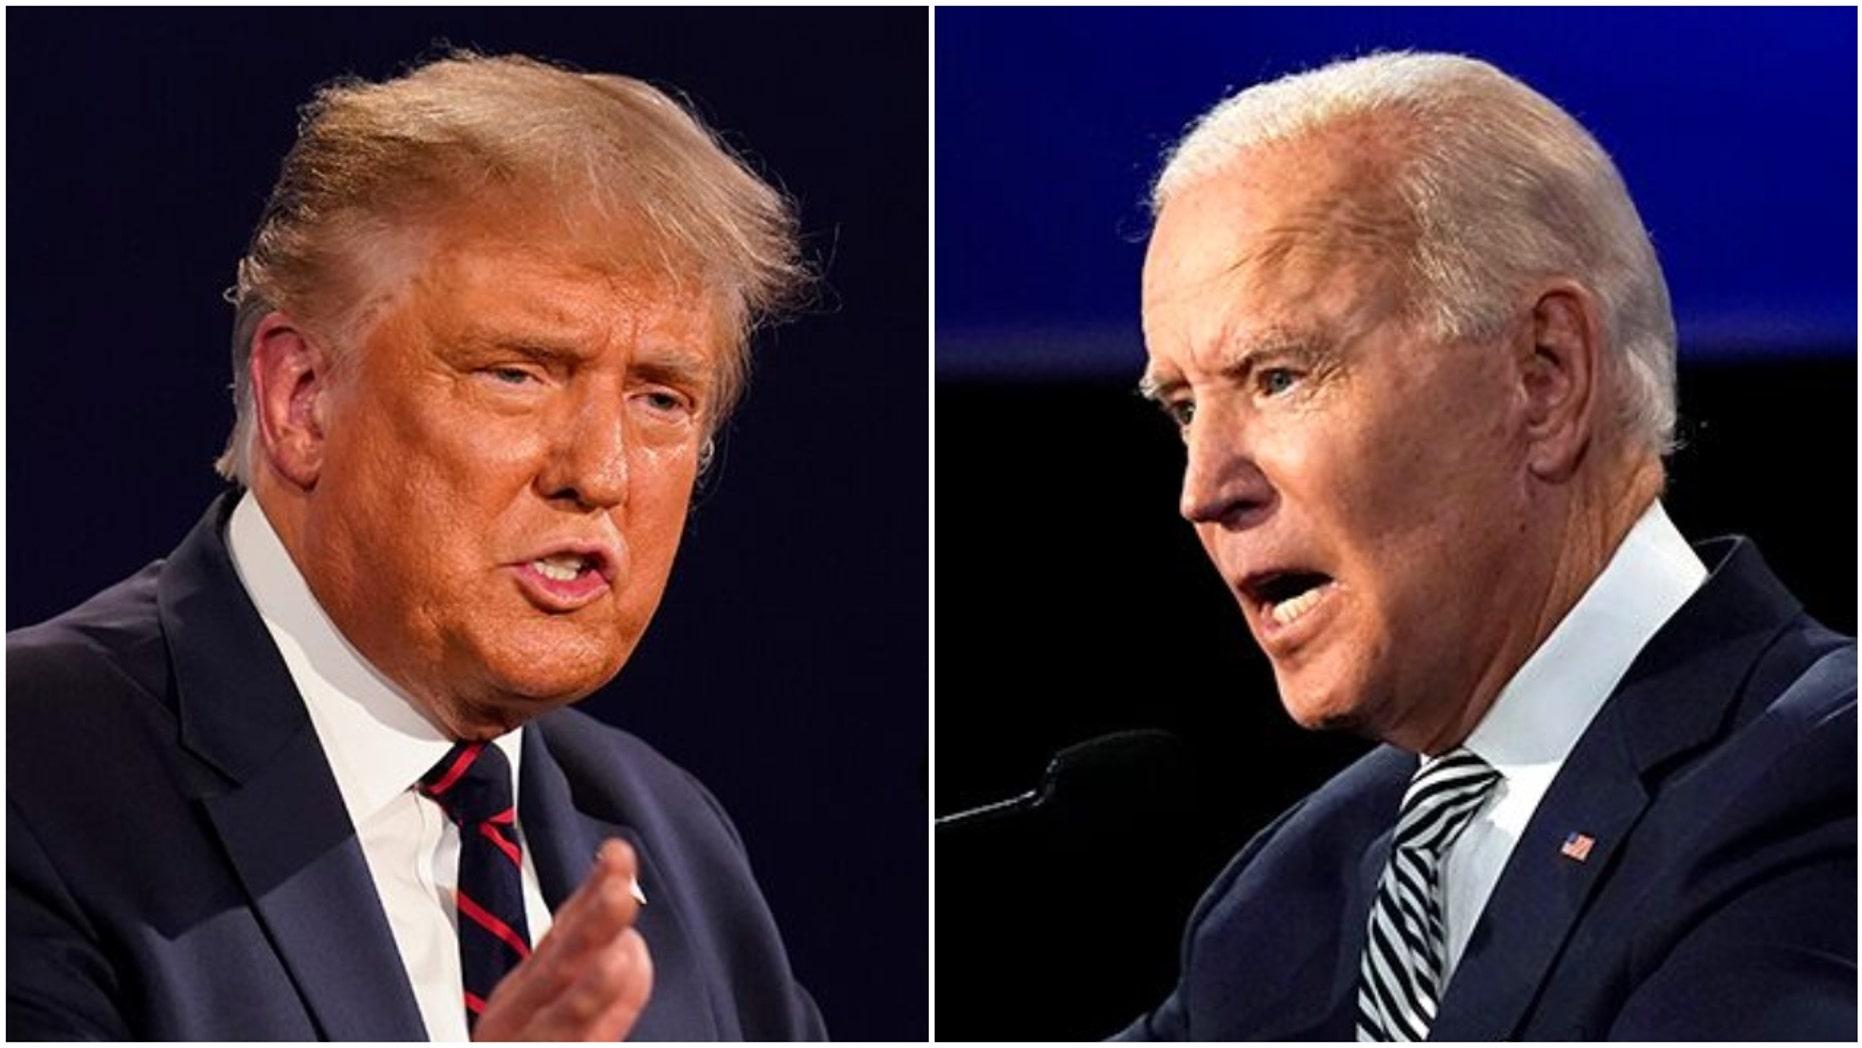 Trump-Biden face-off has debate panel mulling format changes